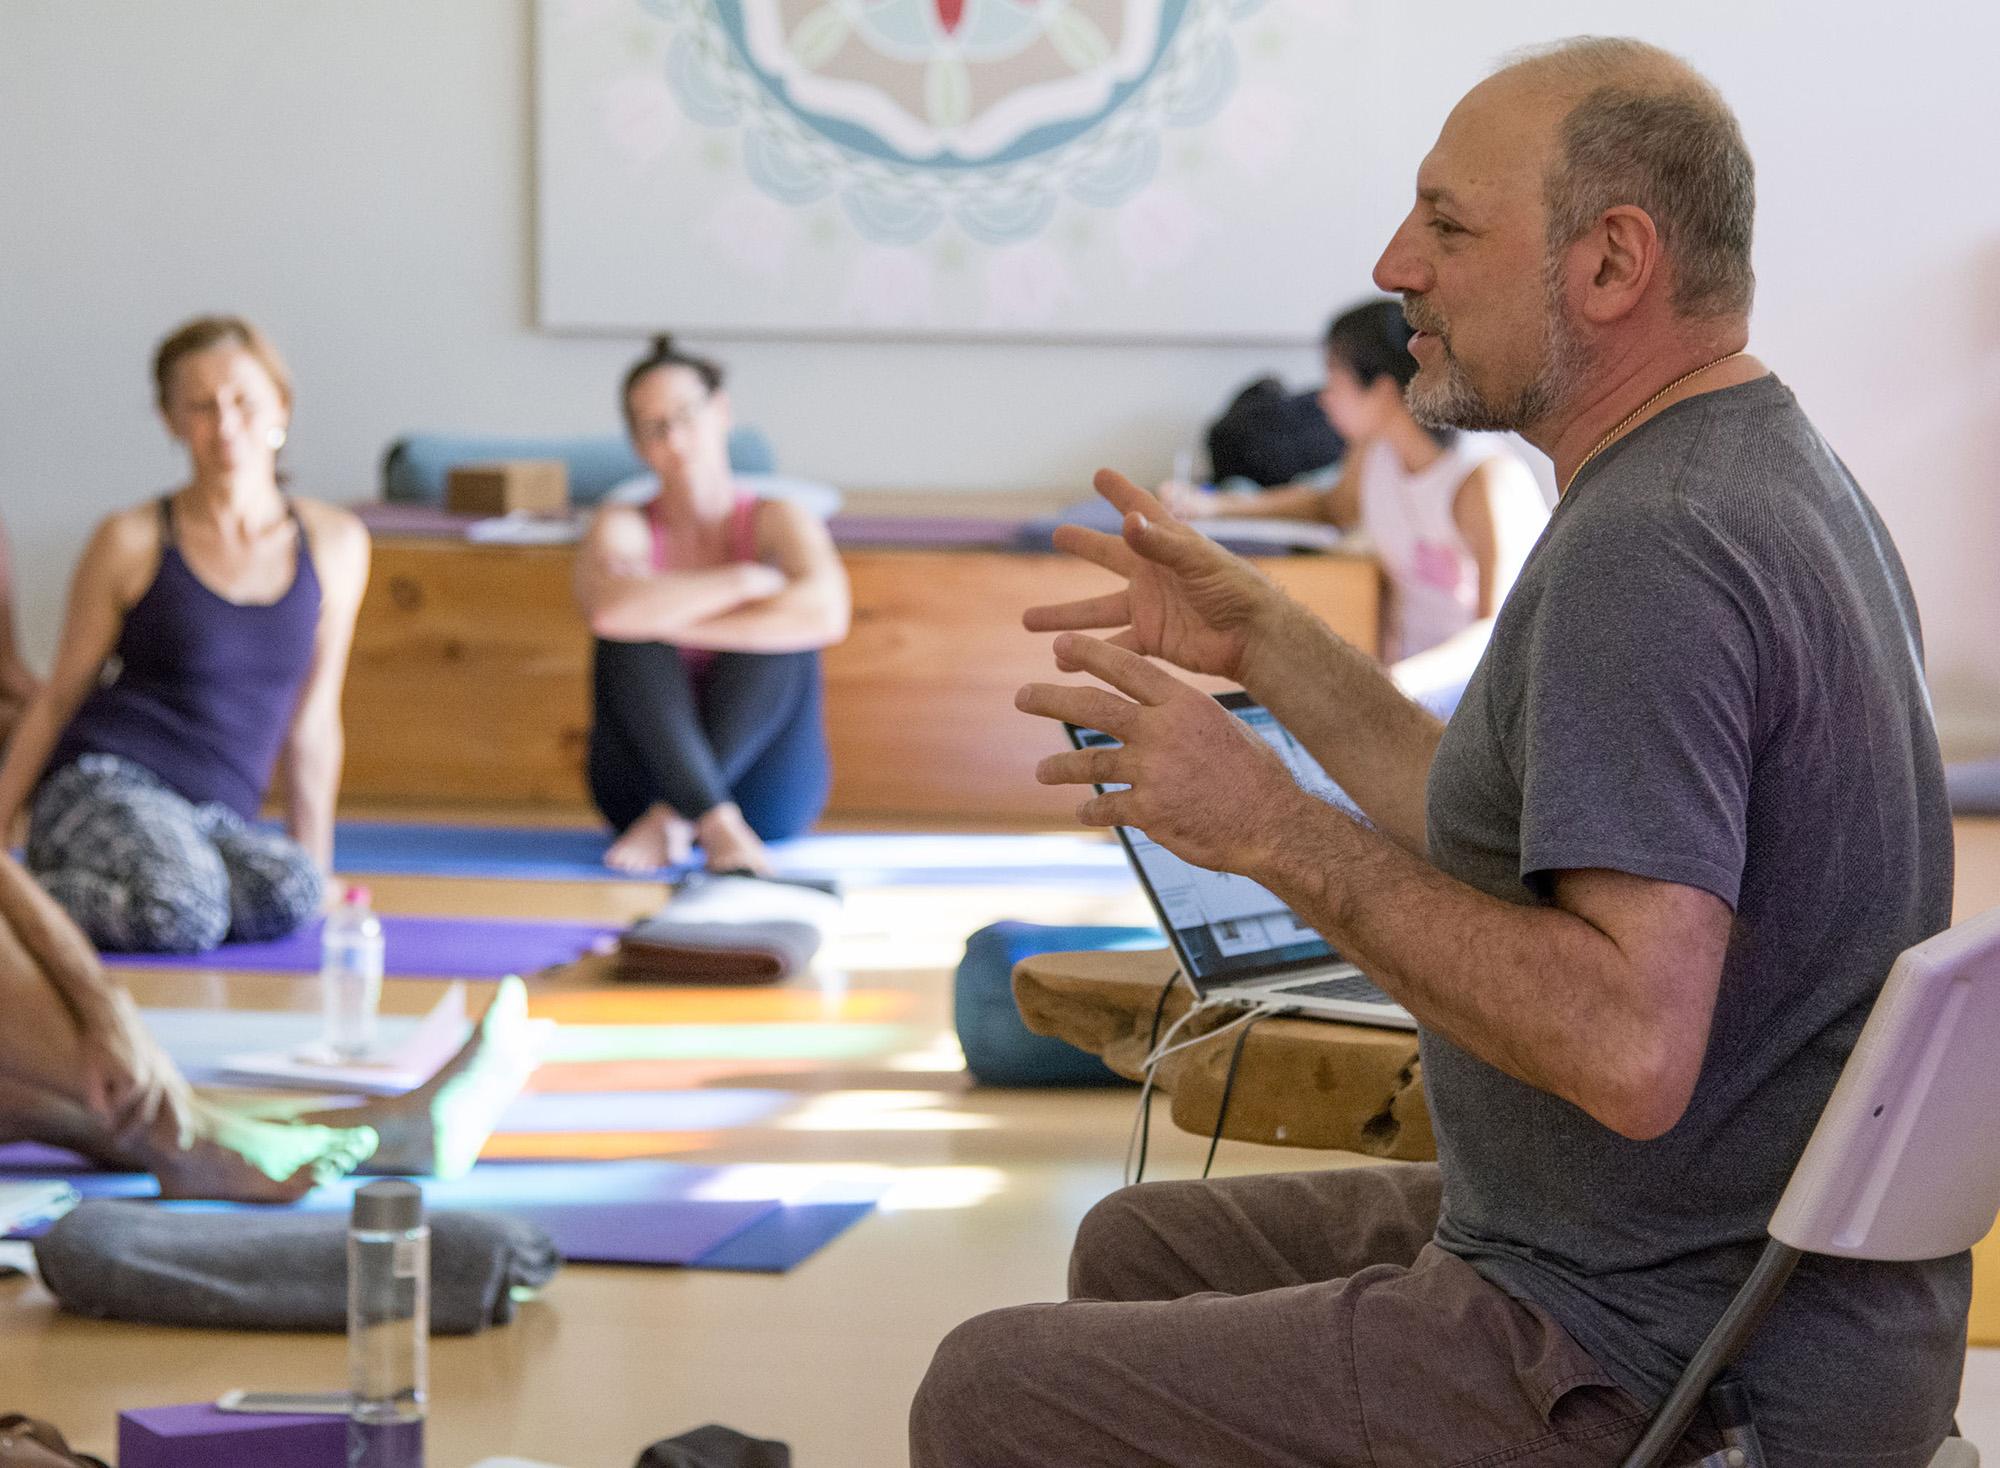 Leslie Kaminoff yoga